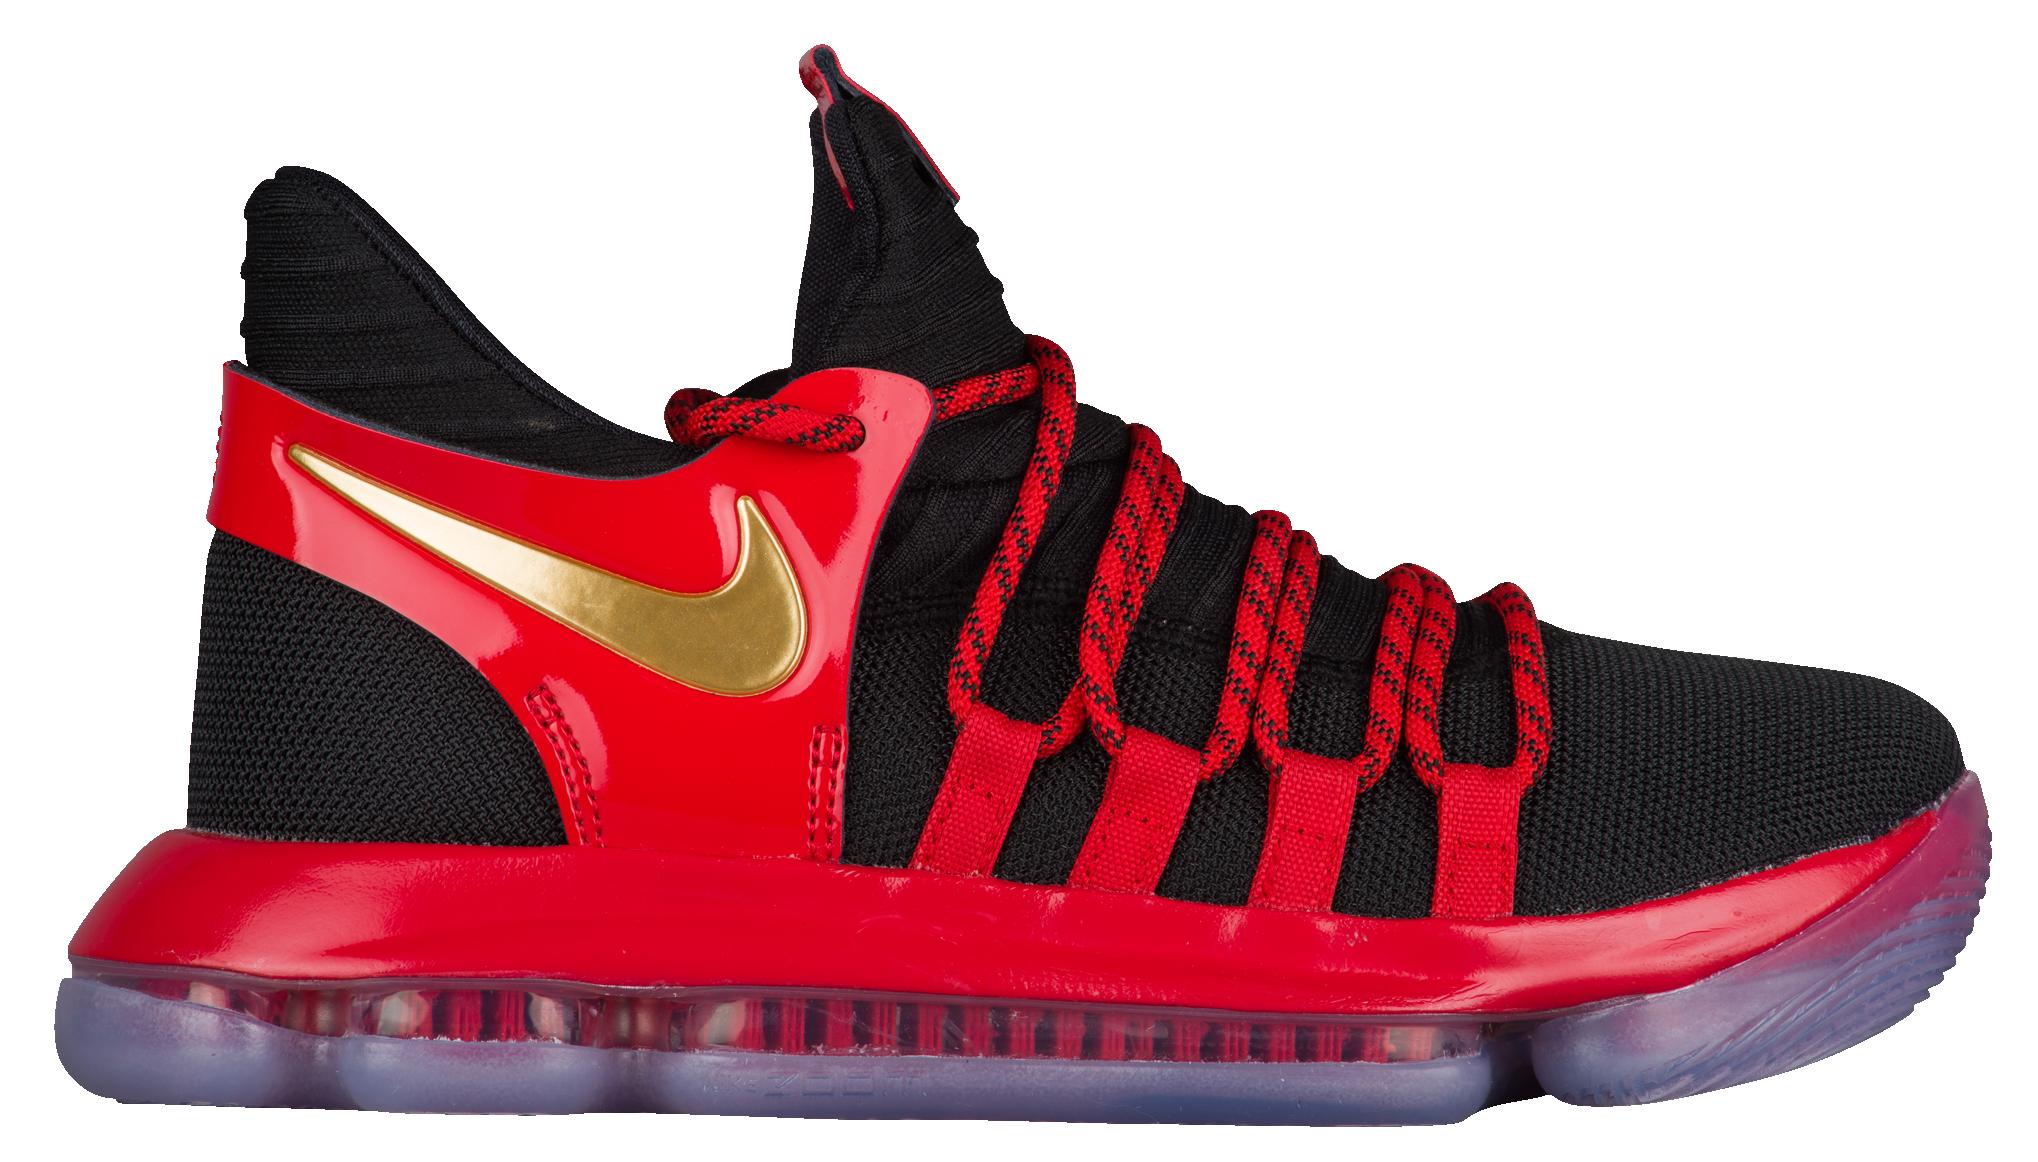 2740c0ebc93 Cheap Nike Kd V Boys Grade School